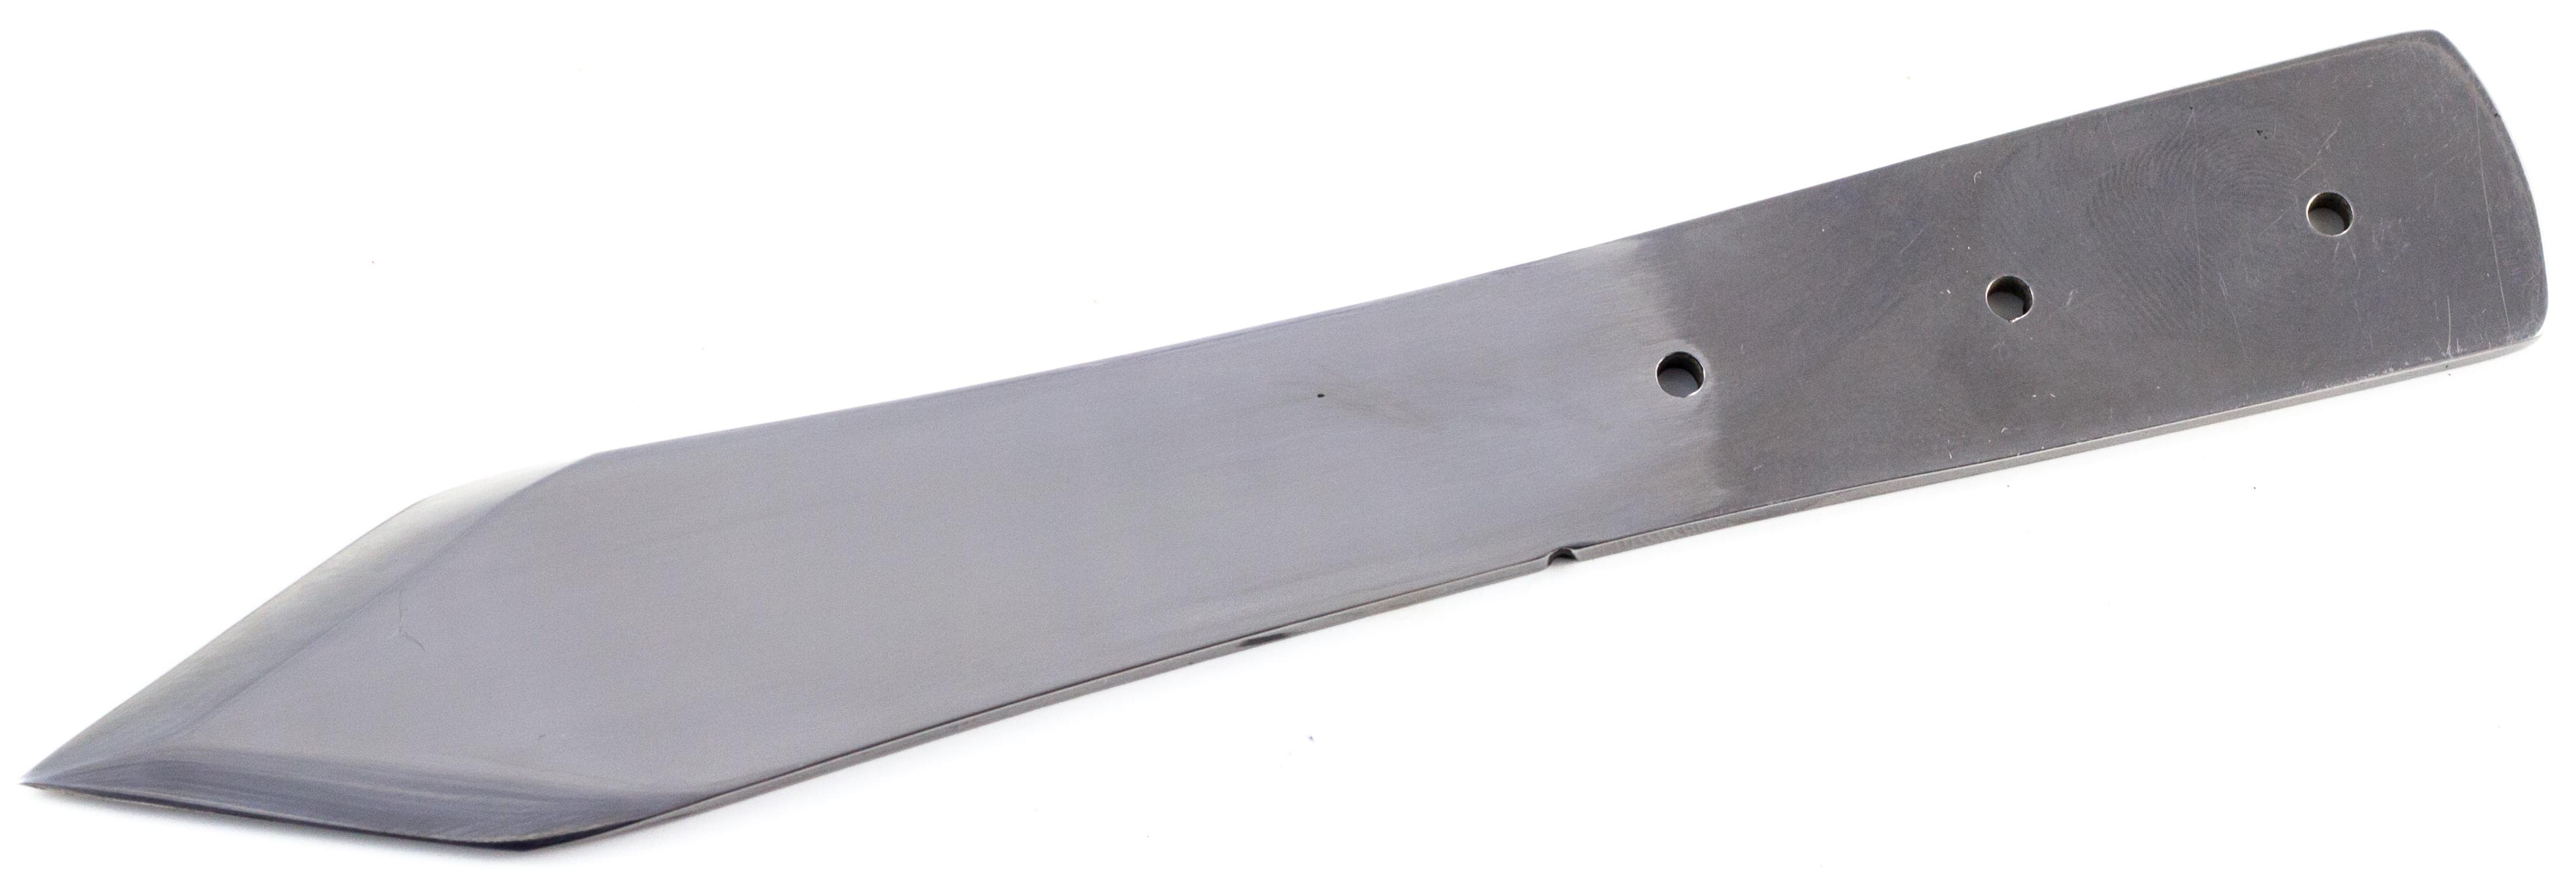 sheffield wurfmesser klinge 4 sheffield gebrauchsklingen sheffield knives messerklingen. Black Bedroom Furniture Sets. Home Design Ideas